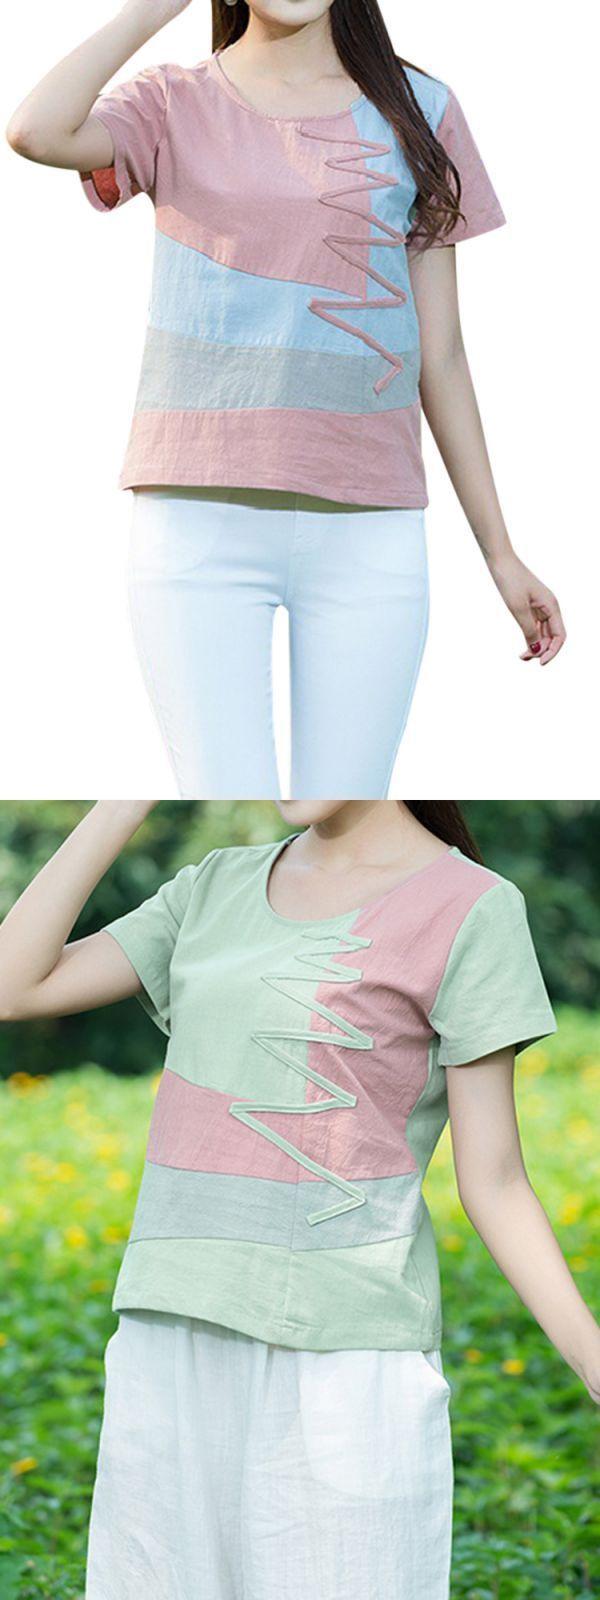 Casual women short sleeve patchwork o-neckline t-shirts superman t shirt girl india #gossip #girl #t #shirts #uk #quality #womens #t #shirts #t #shirt #clever #girl #woman #t #shirt #mockup